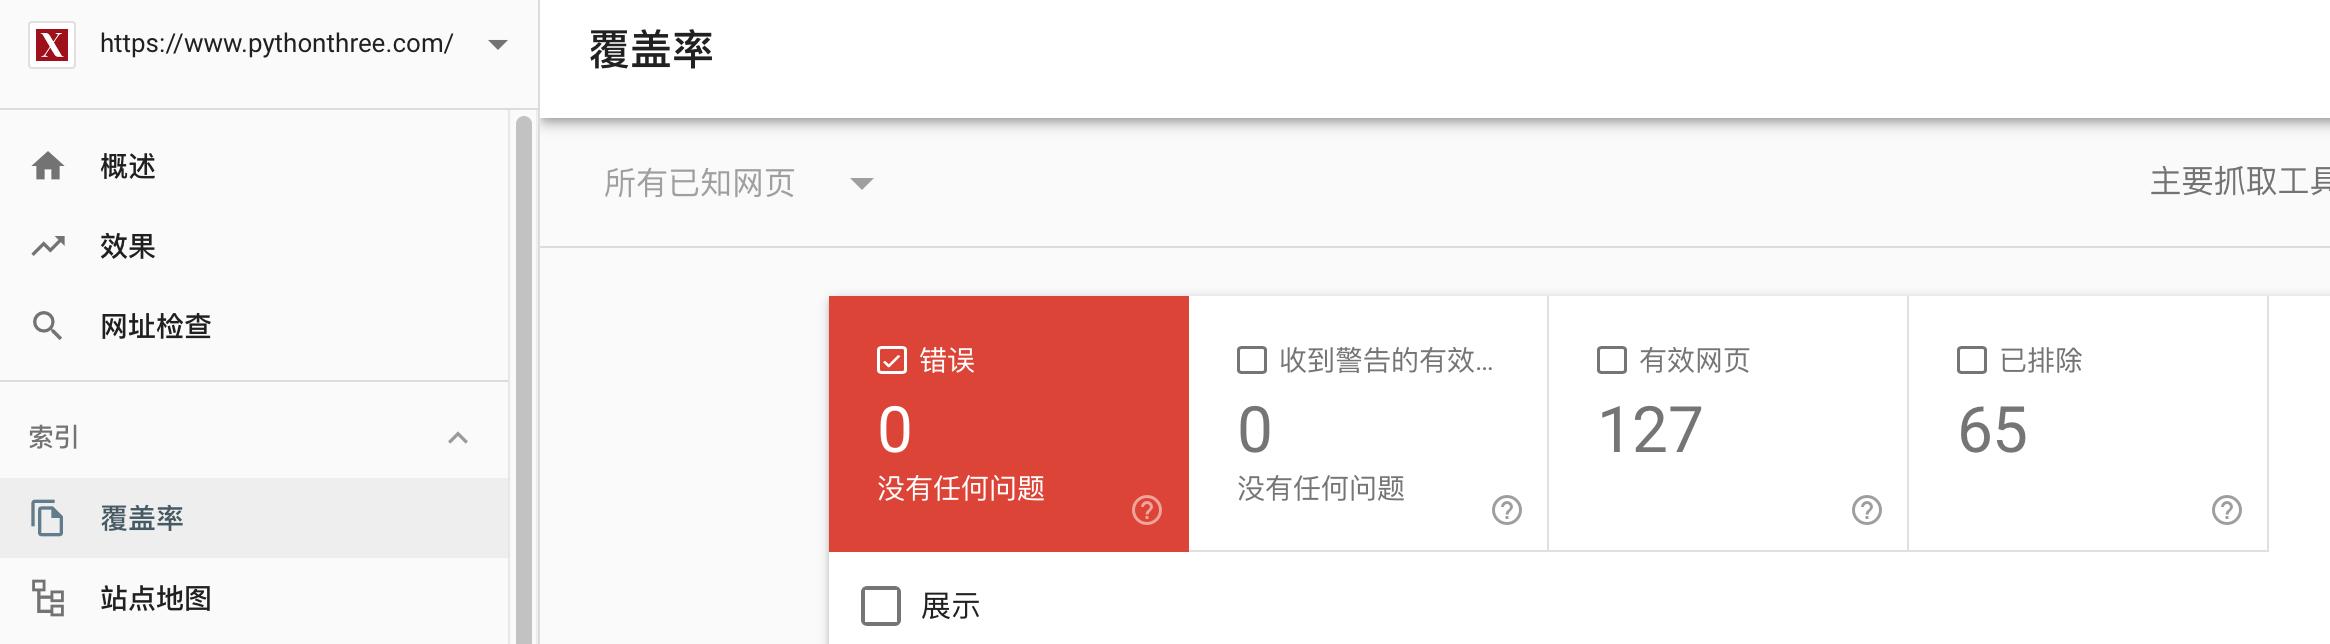 Google search console站长工具索引